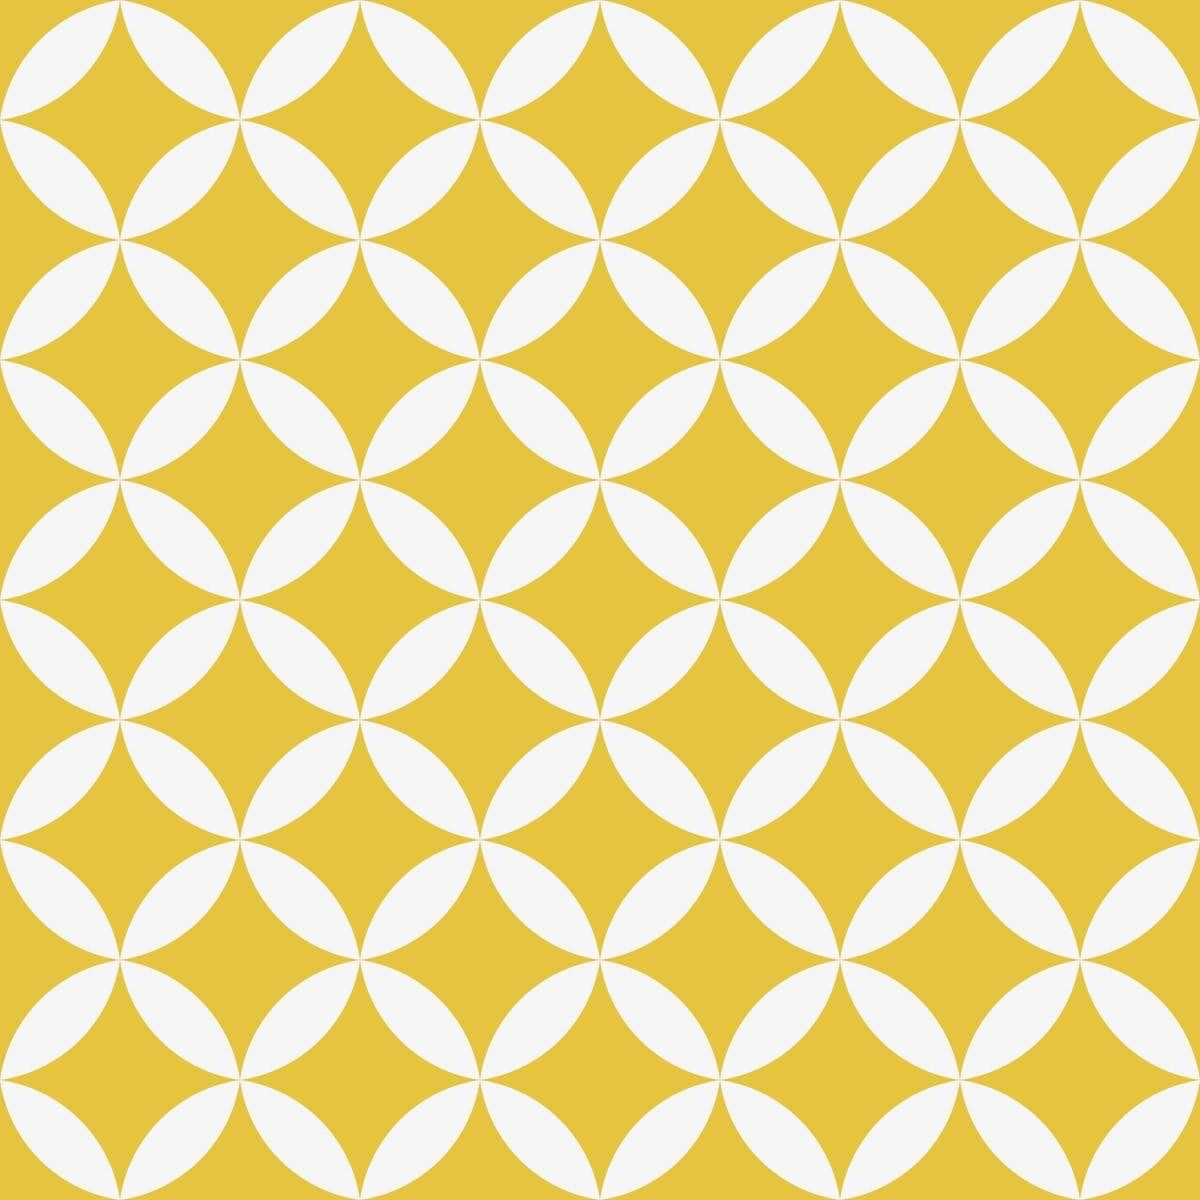 Papel de Parede Adesivo Retrô Branco e Amarelo - Redecorei